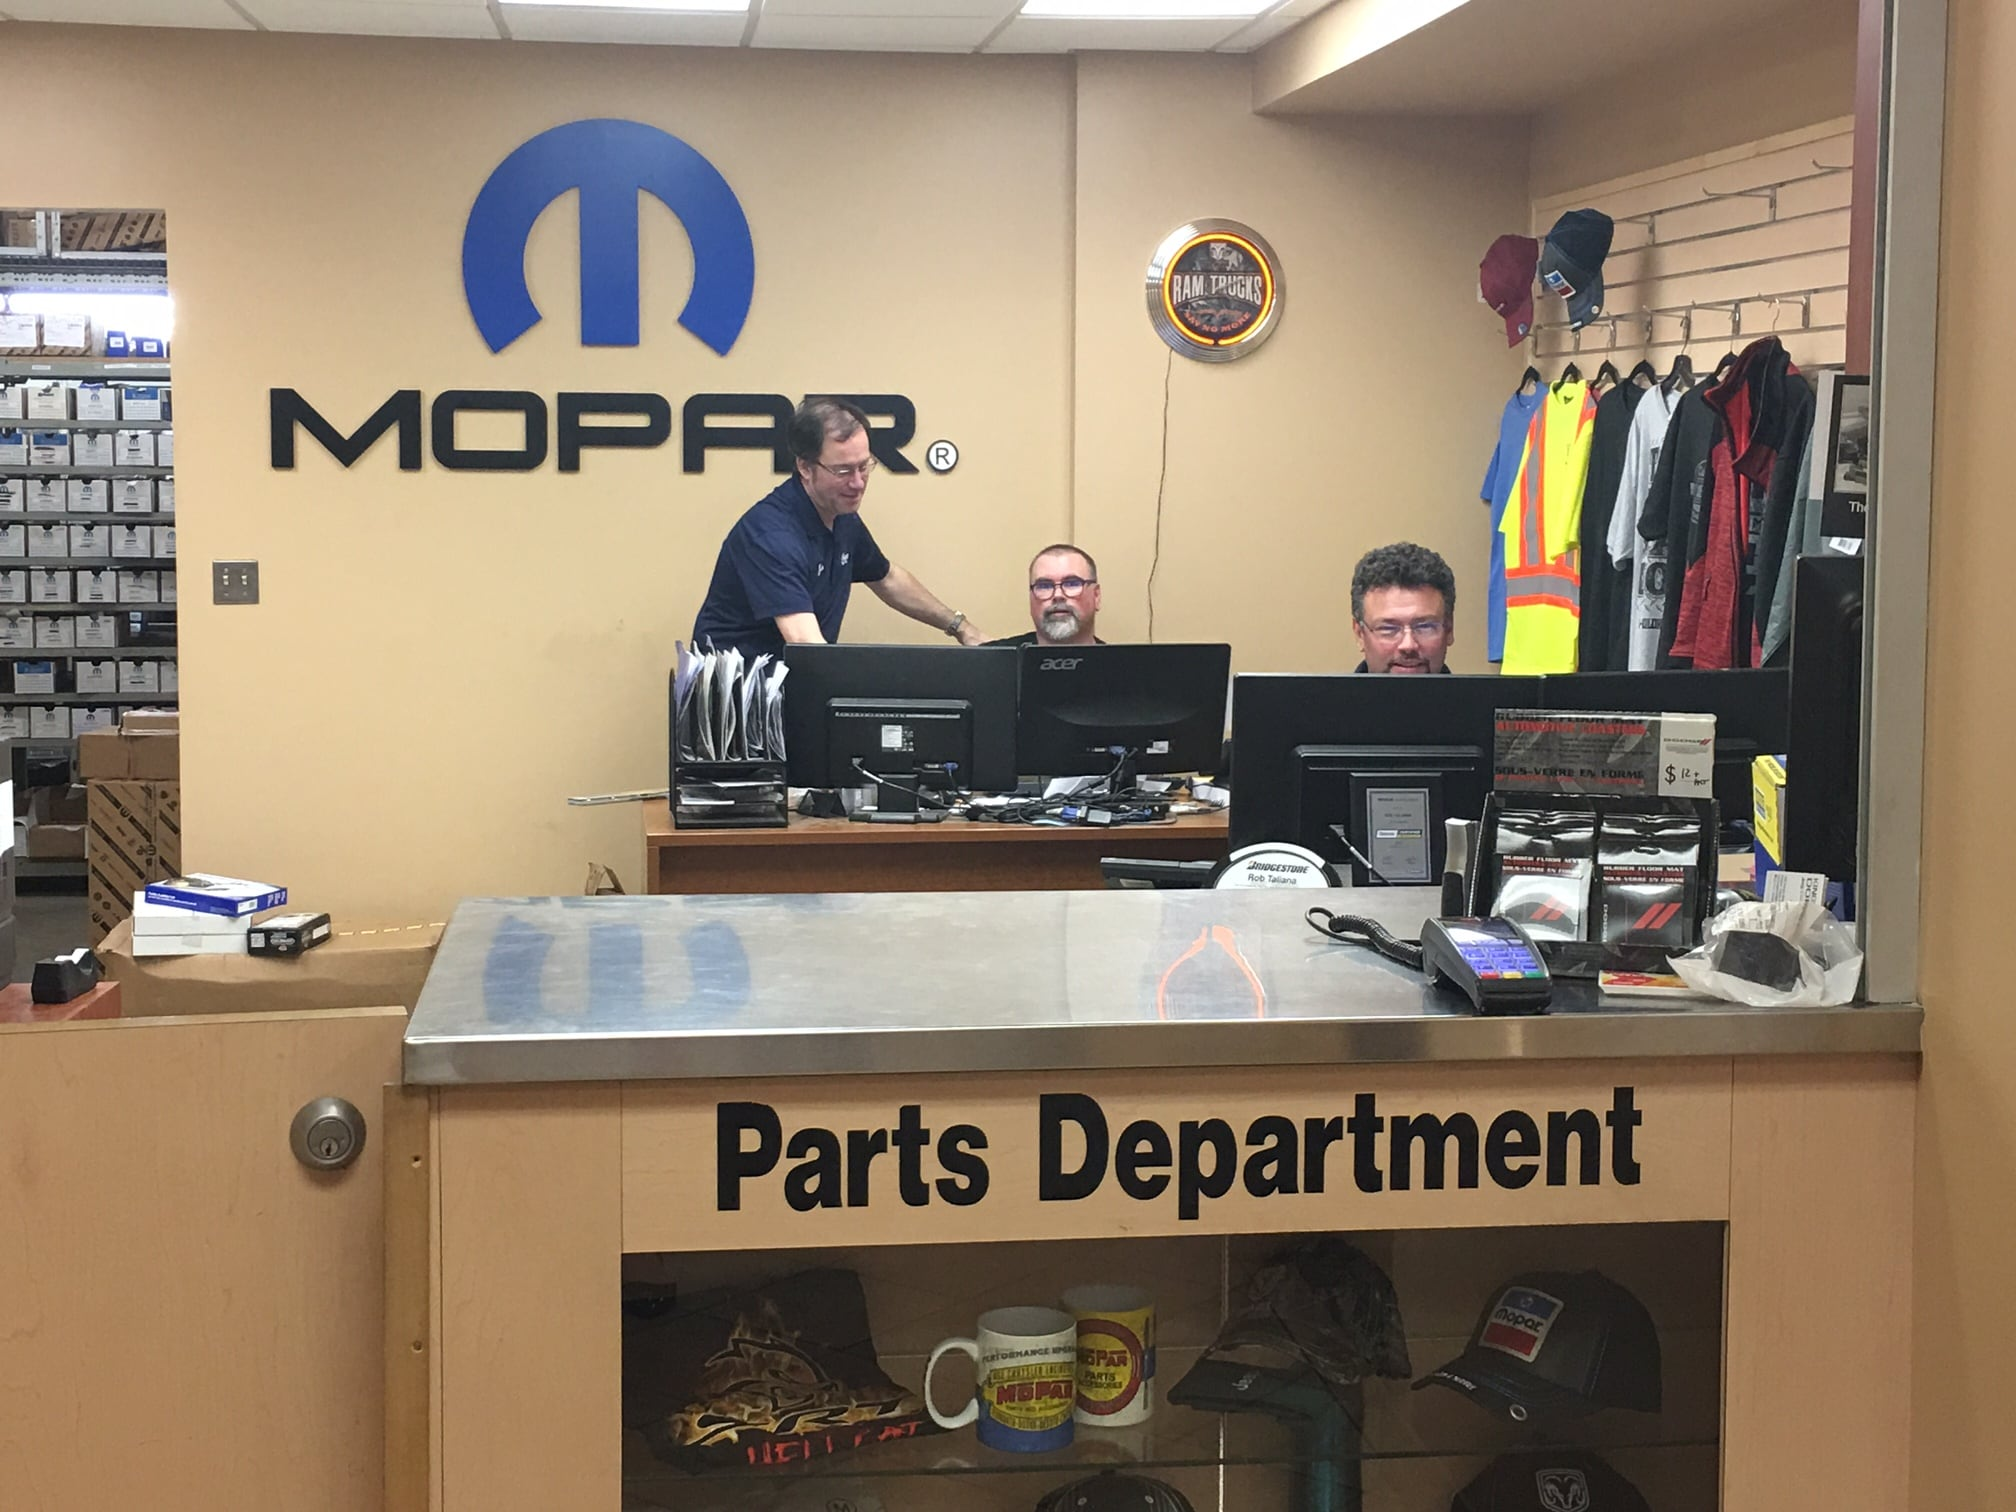 dealership woodbridge service virginia collision lustine jeep dodge department parts custom extreme va dealer reviews